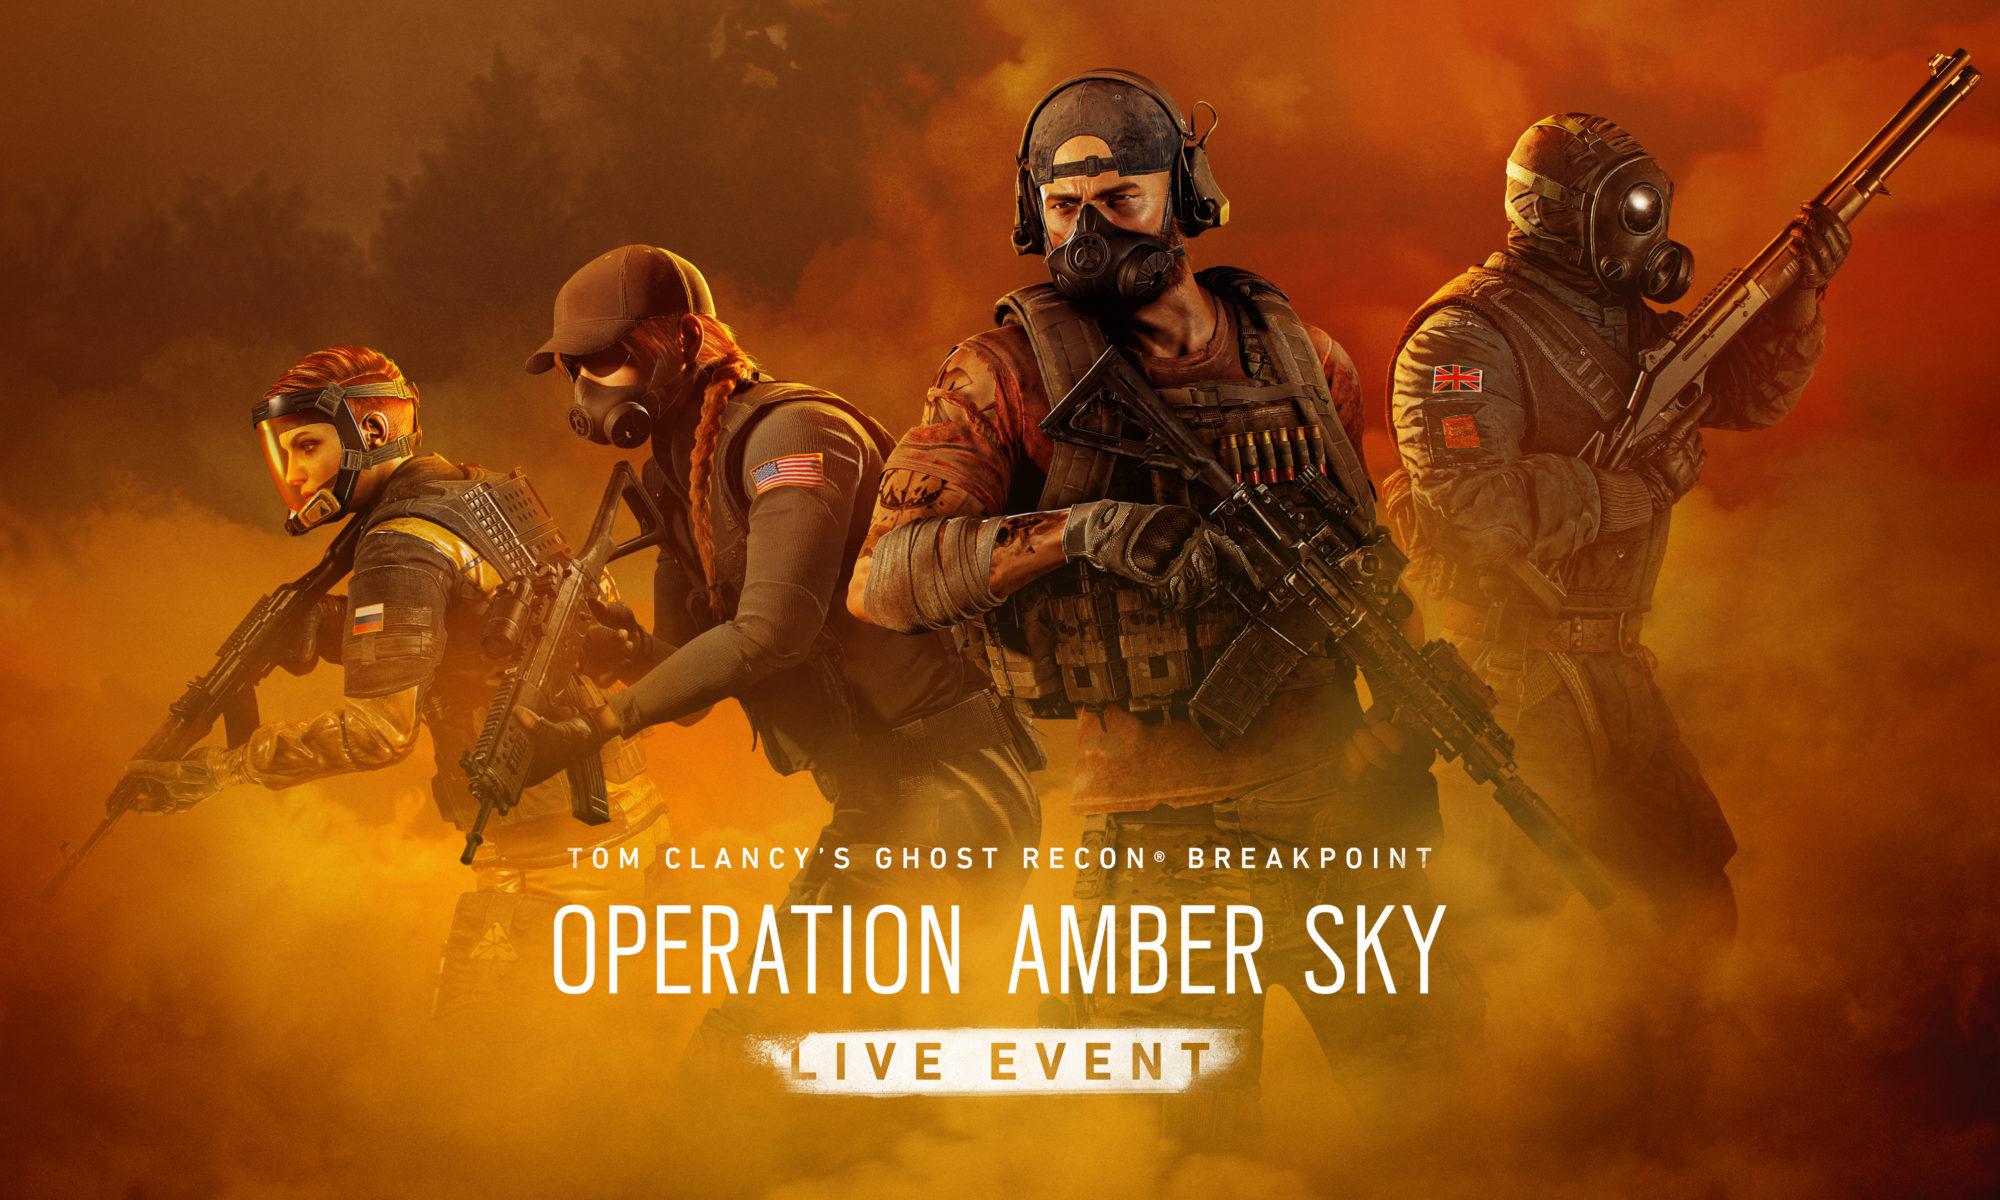 Operation Amber Sky